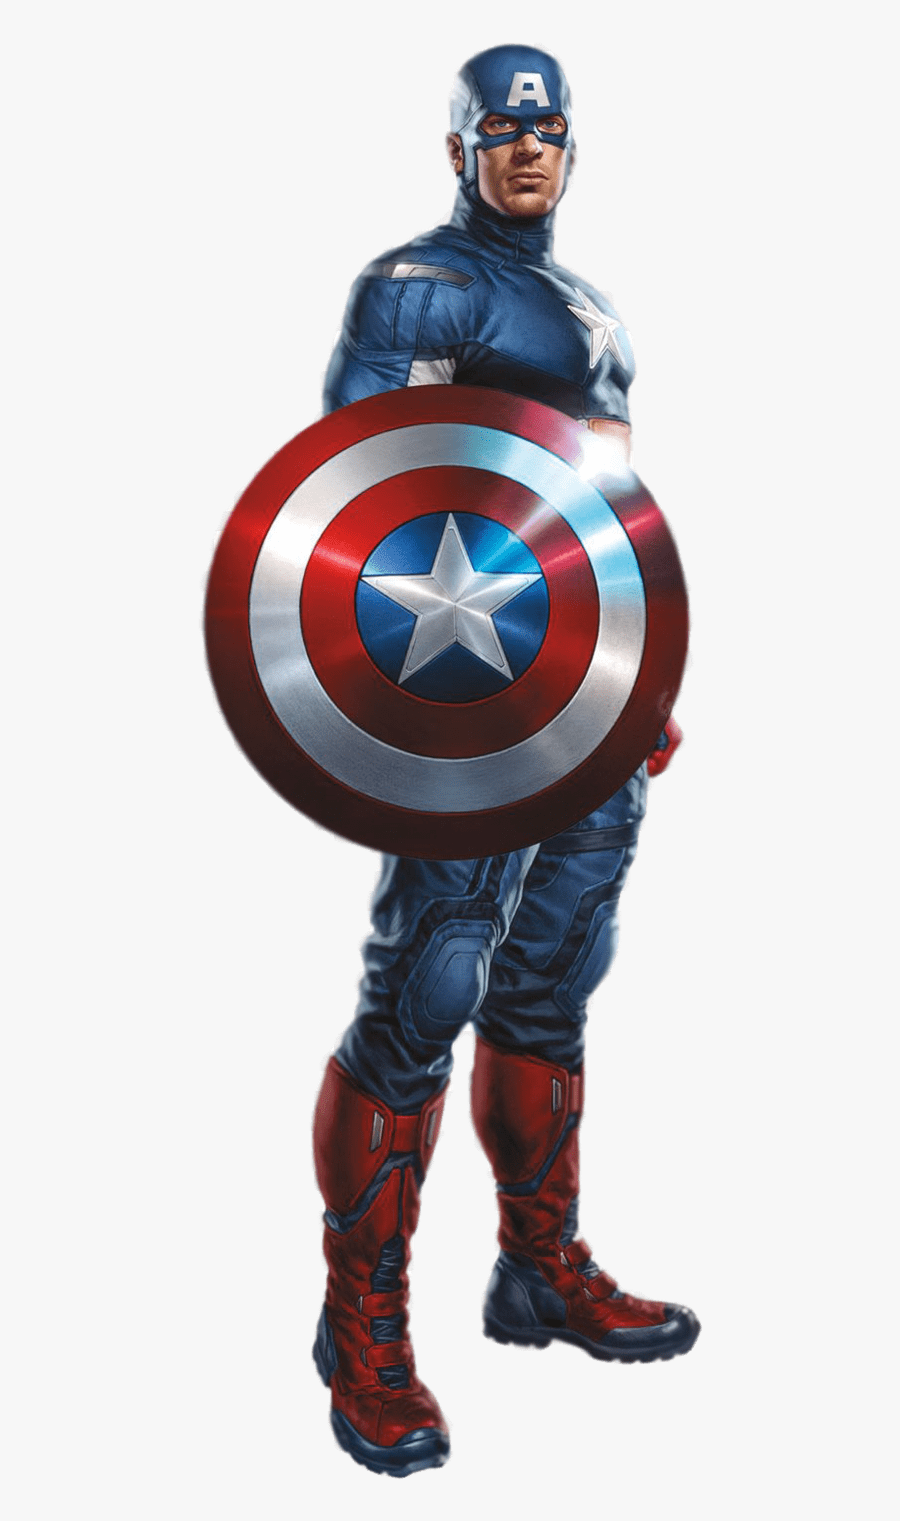 Captain Marvel Clipart Transparent - Iron Man Captain America Avengers, Transparent Clipart